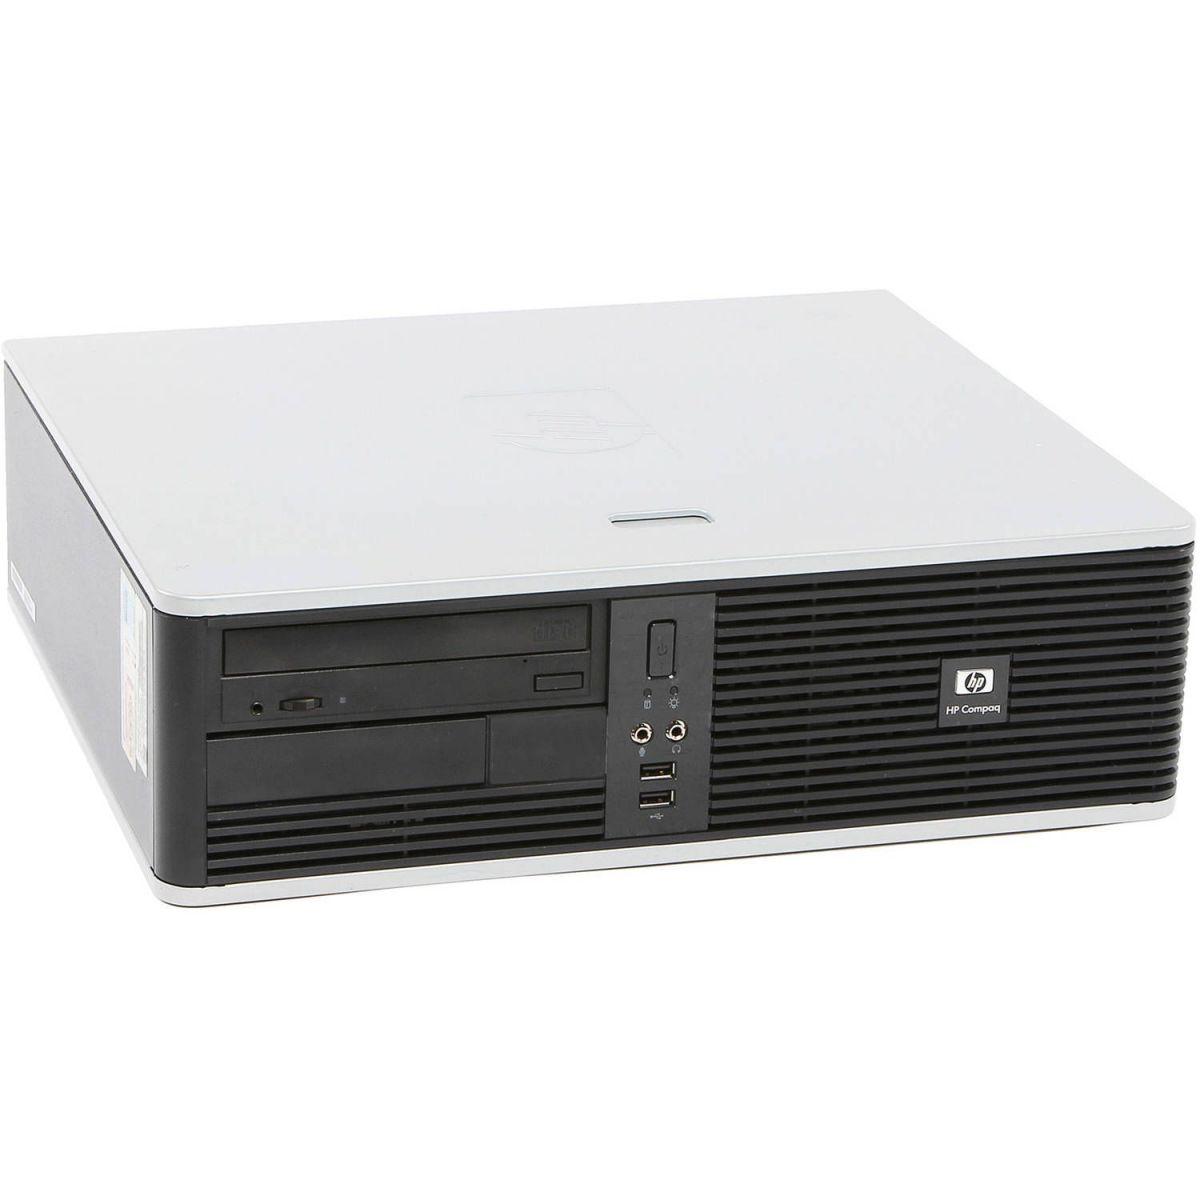 HP Compaq Business DC5800